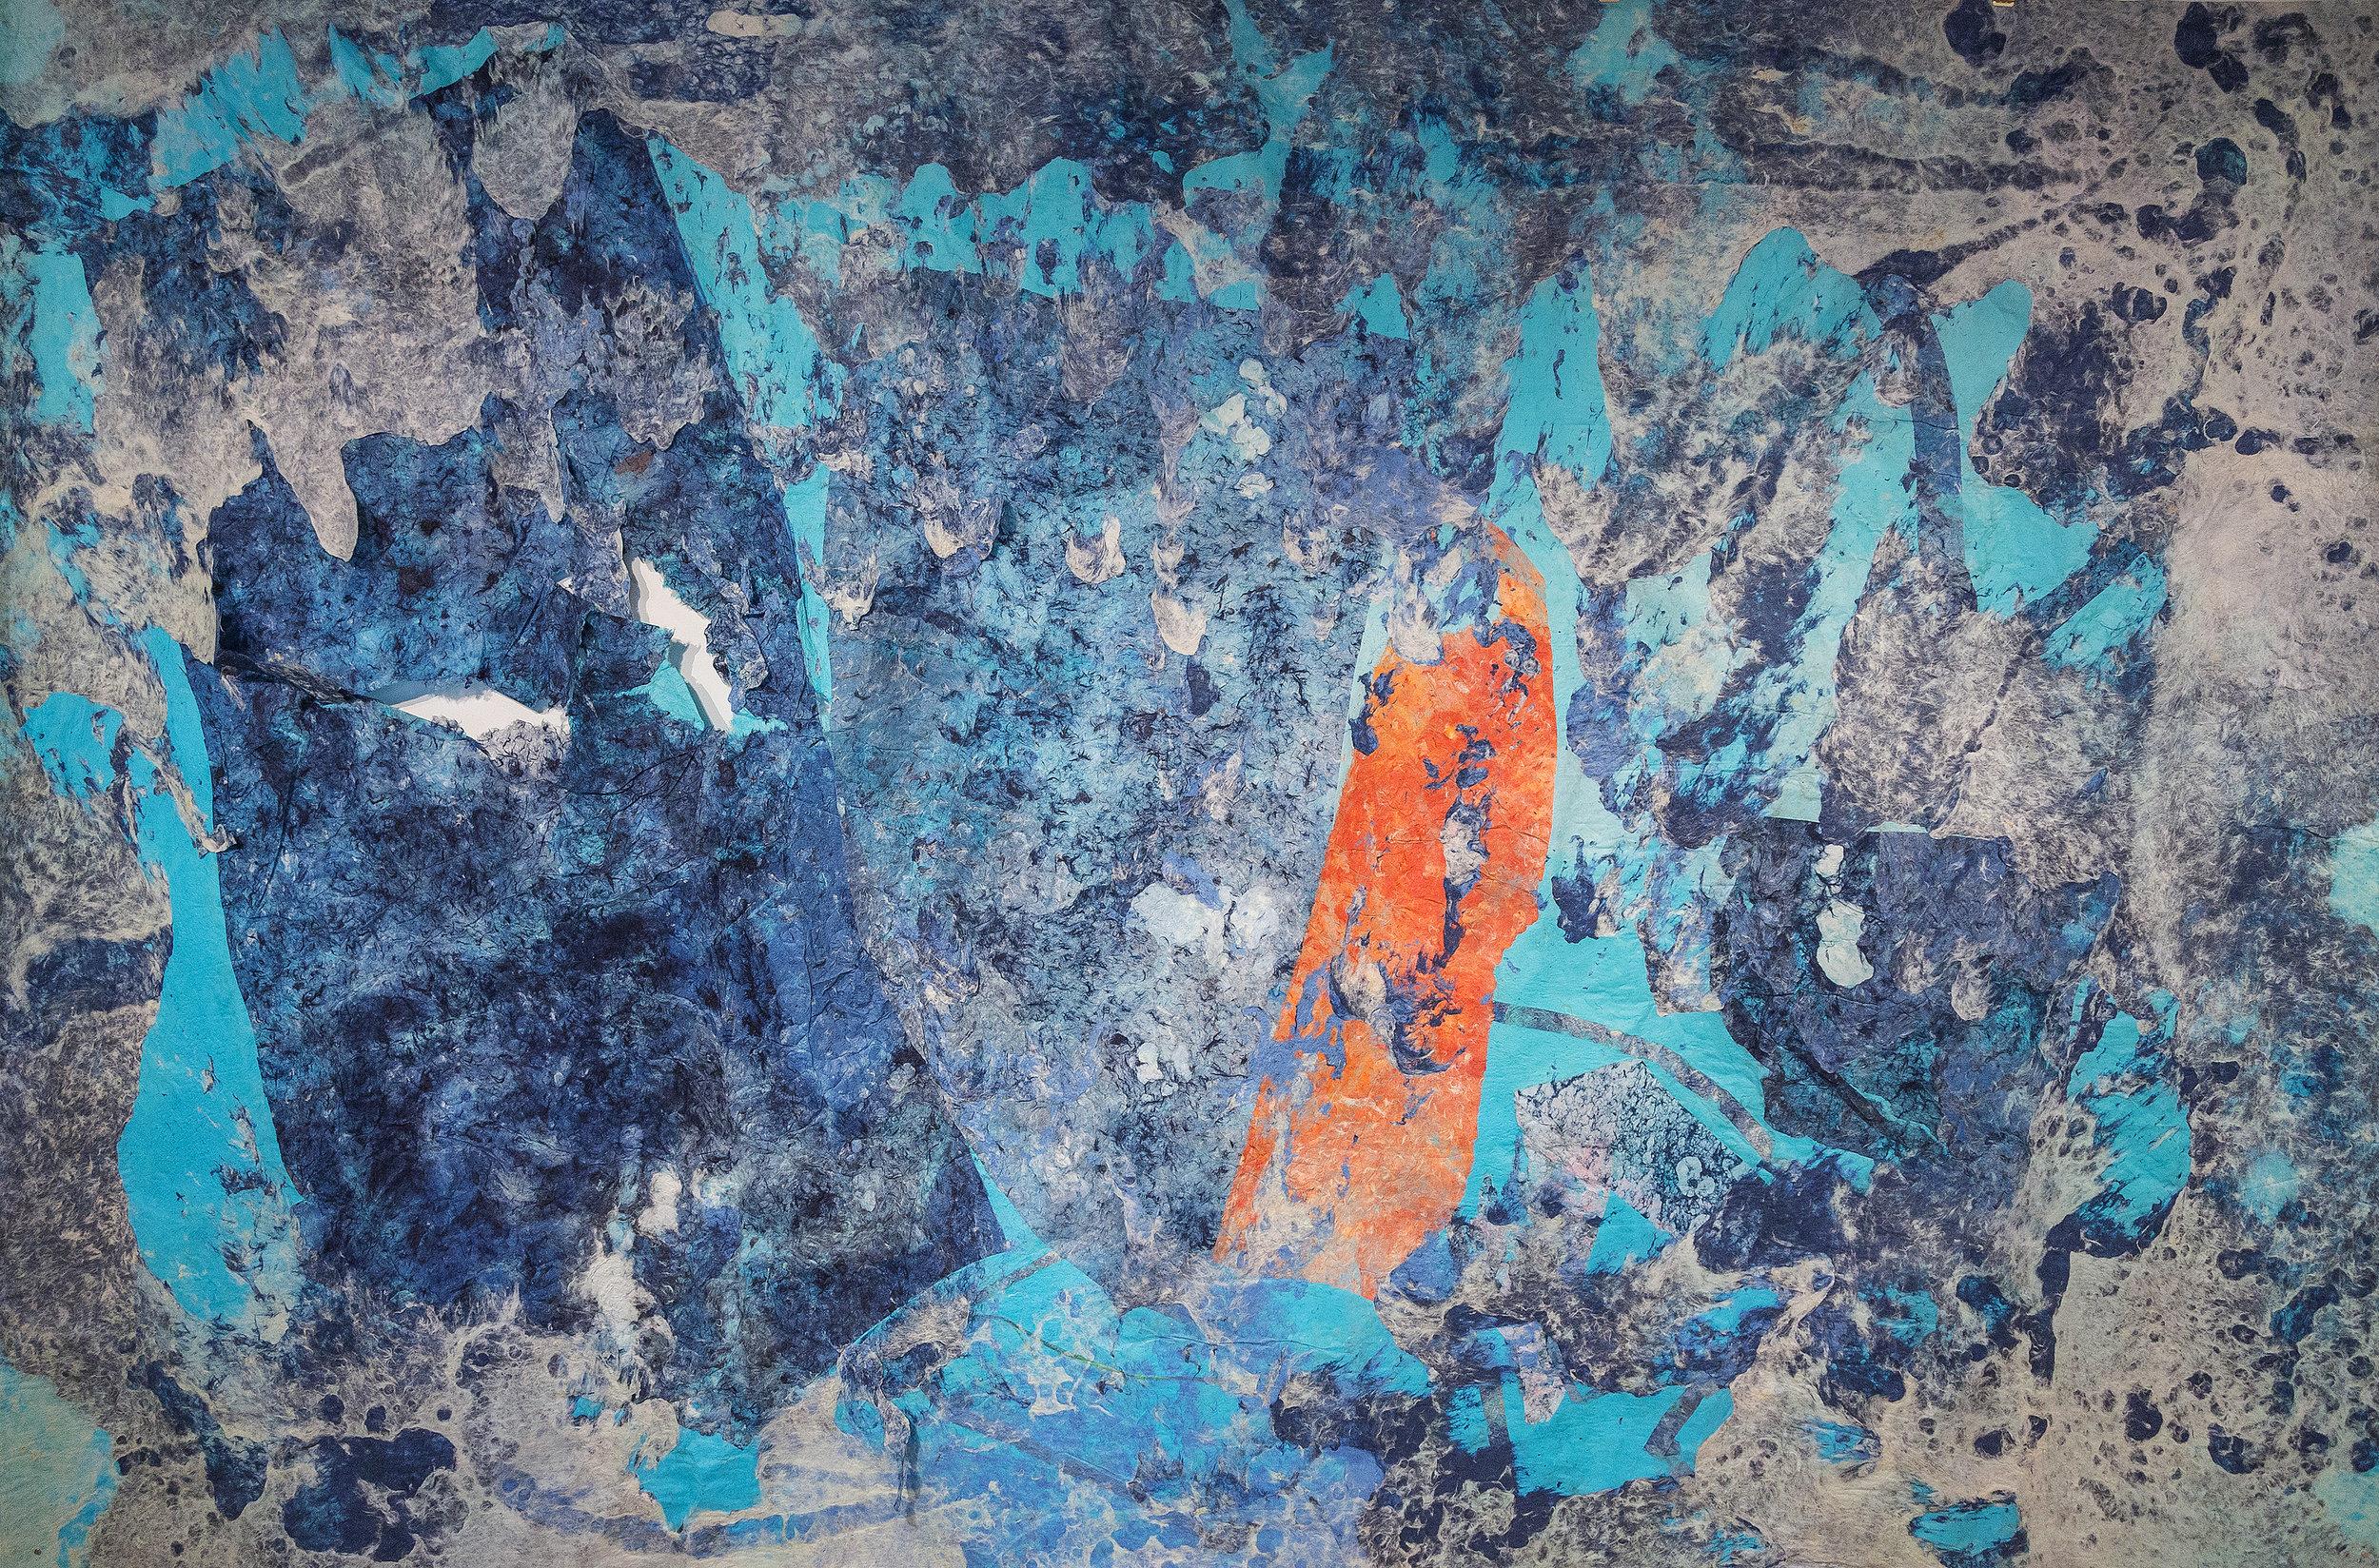 "Do You Feel the Sea Still, 96"" x 144"", kozo, sun, dust, pollen, water, repurposed paper, fiber-reactive dyes, 2016."